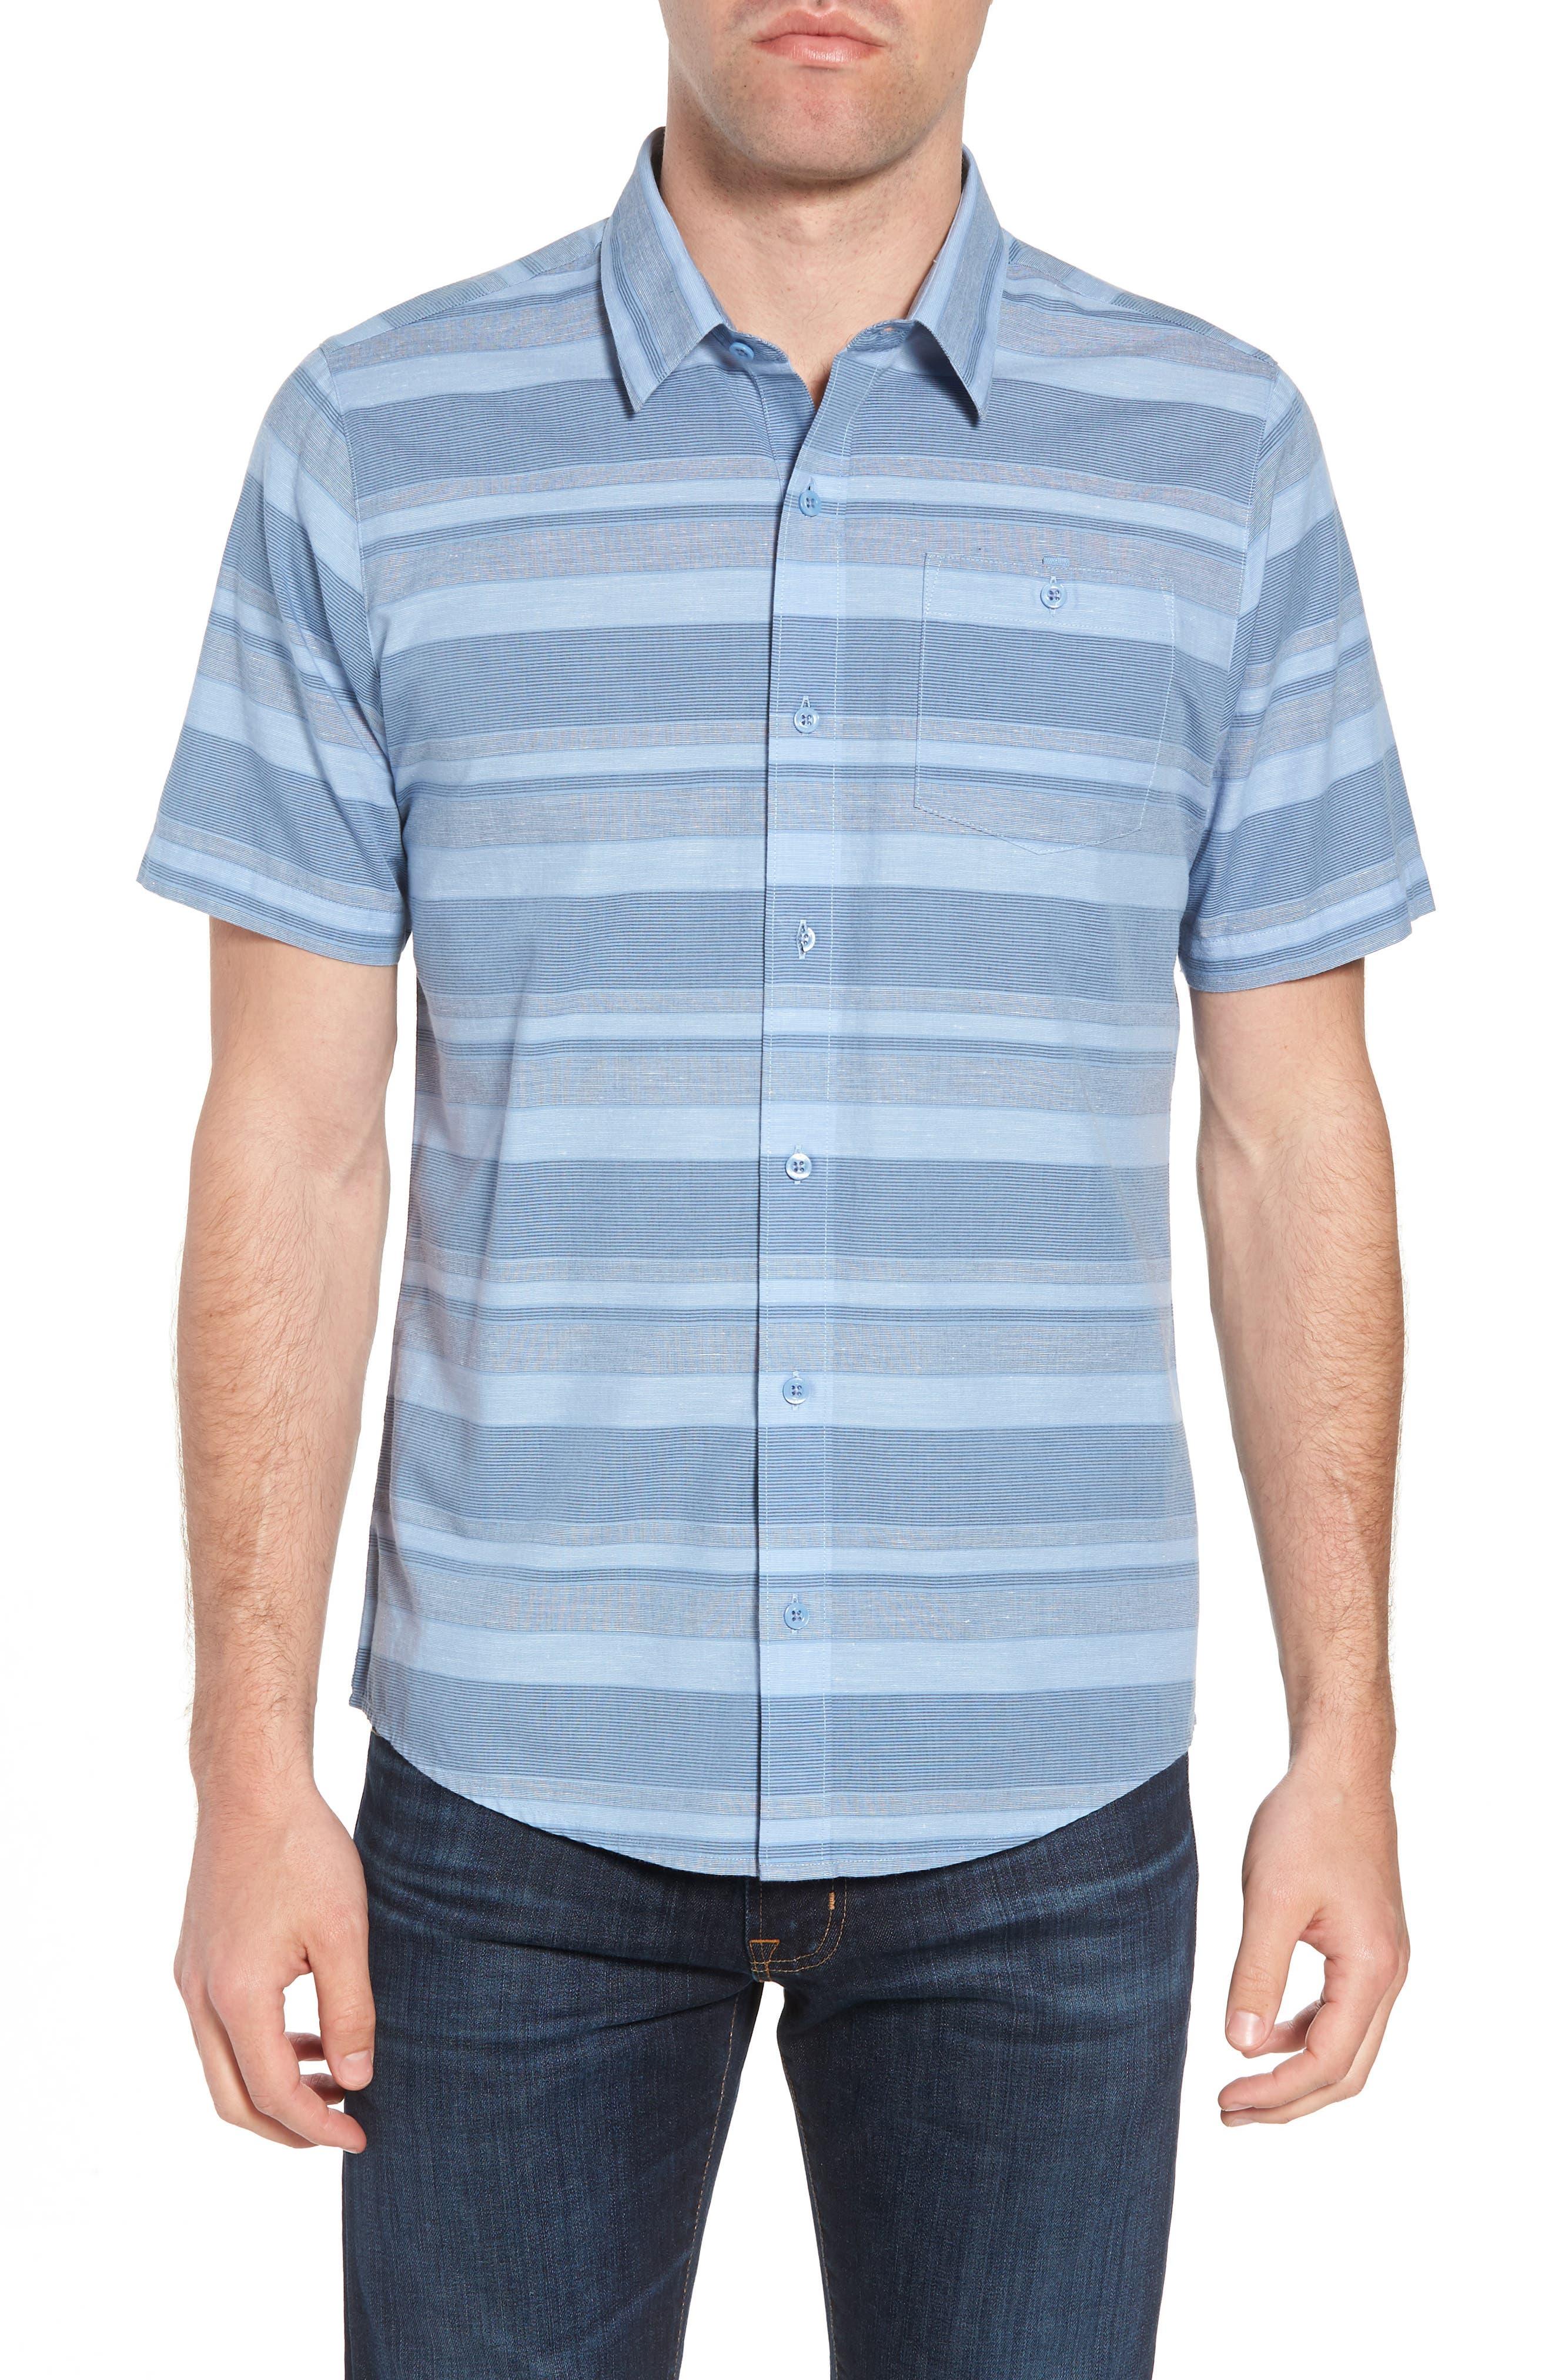 Mahe Regular Fit Sport Shirt,                         Main,                         color, Heather Blue Nights